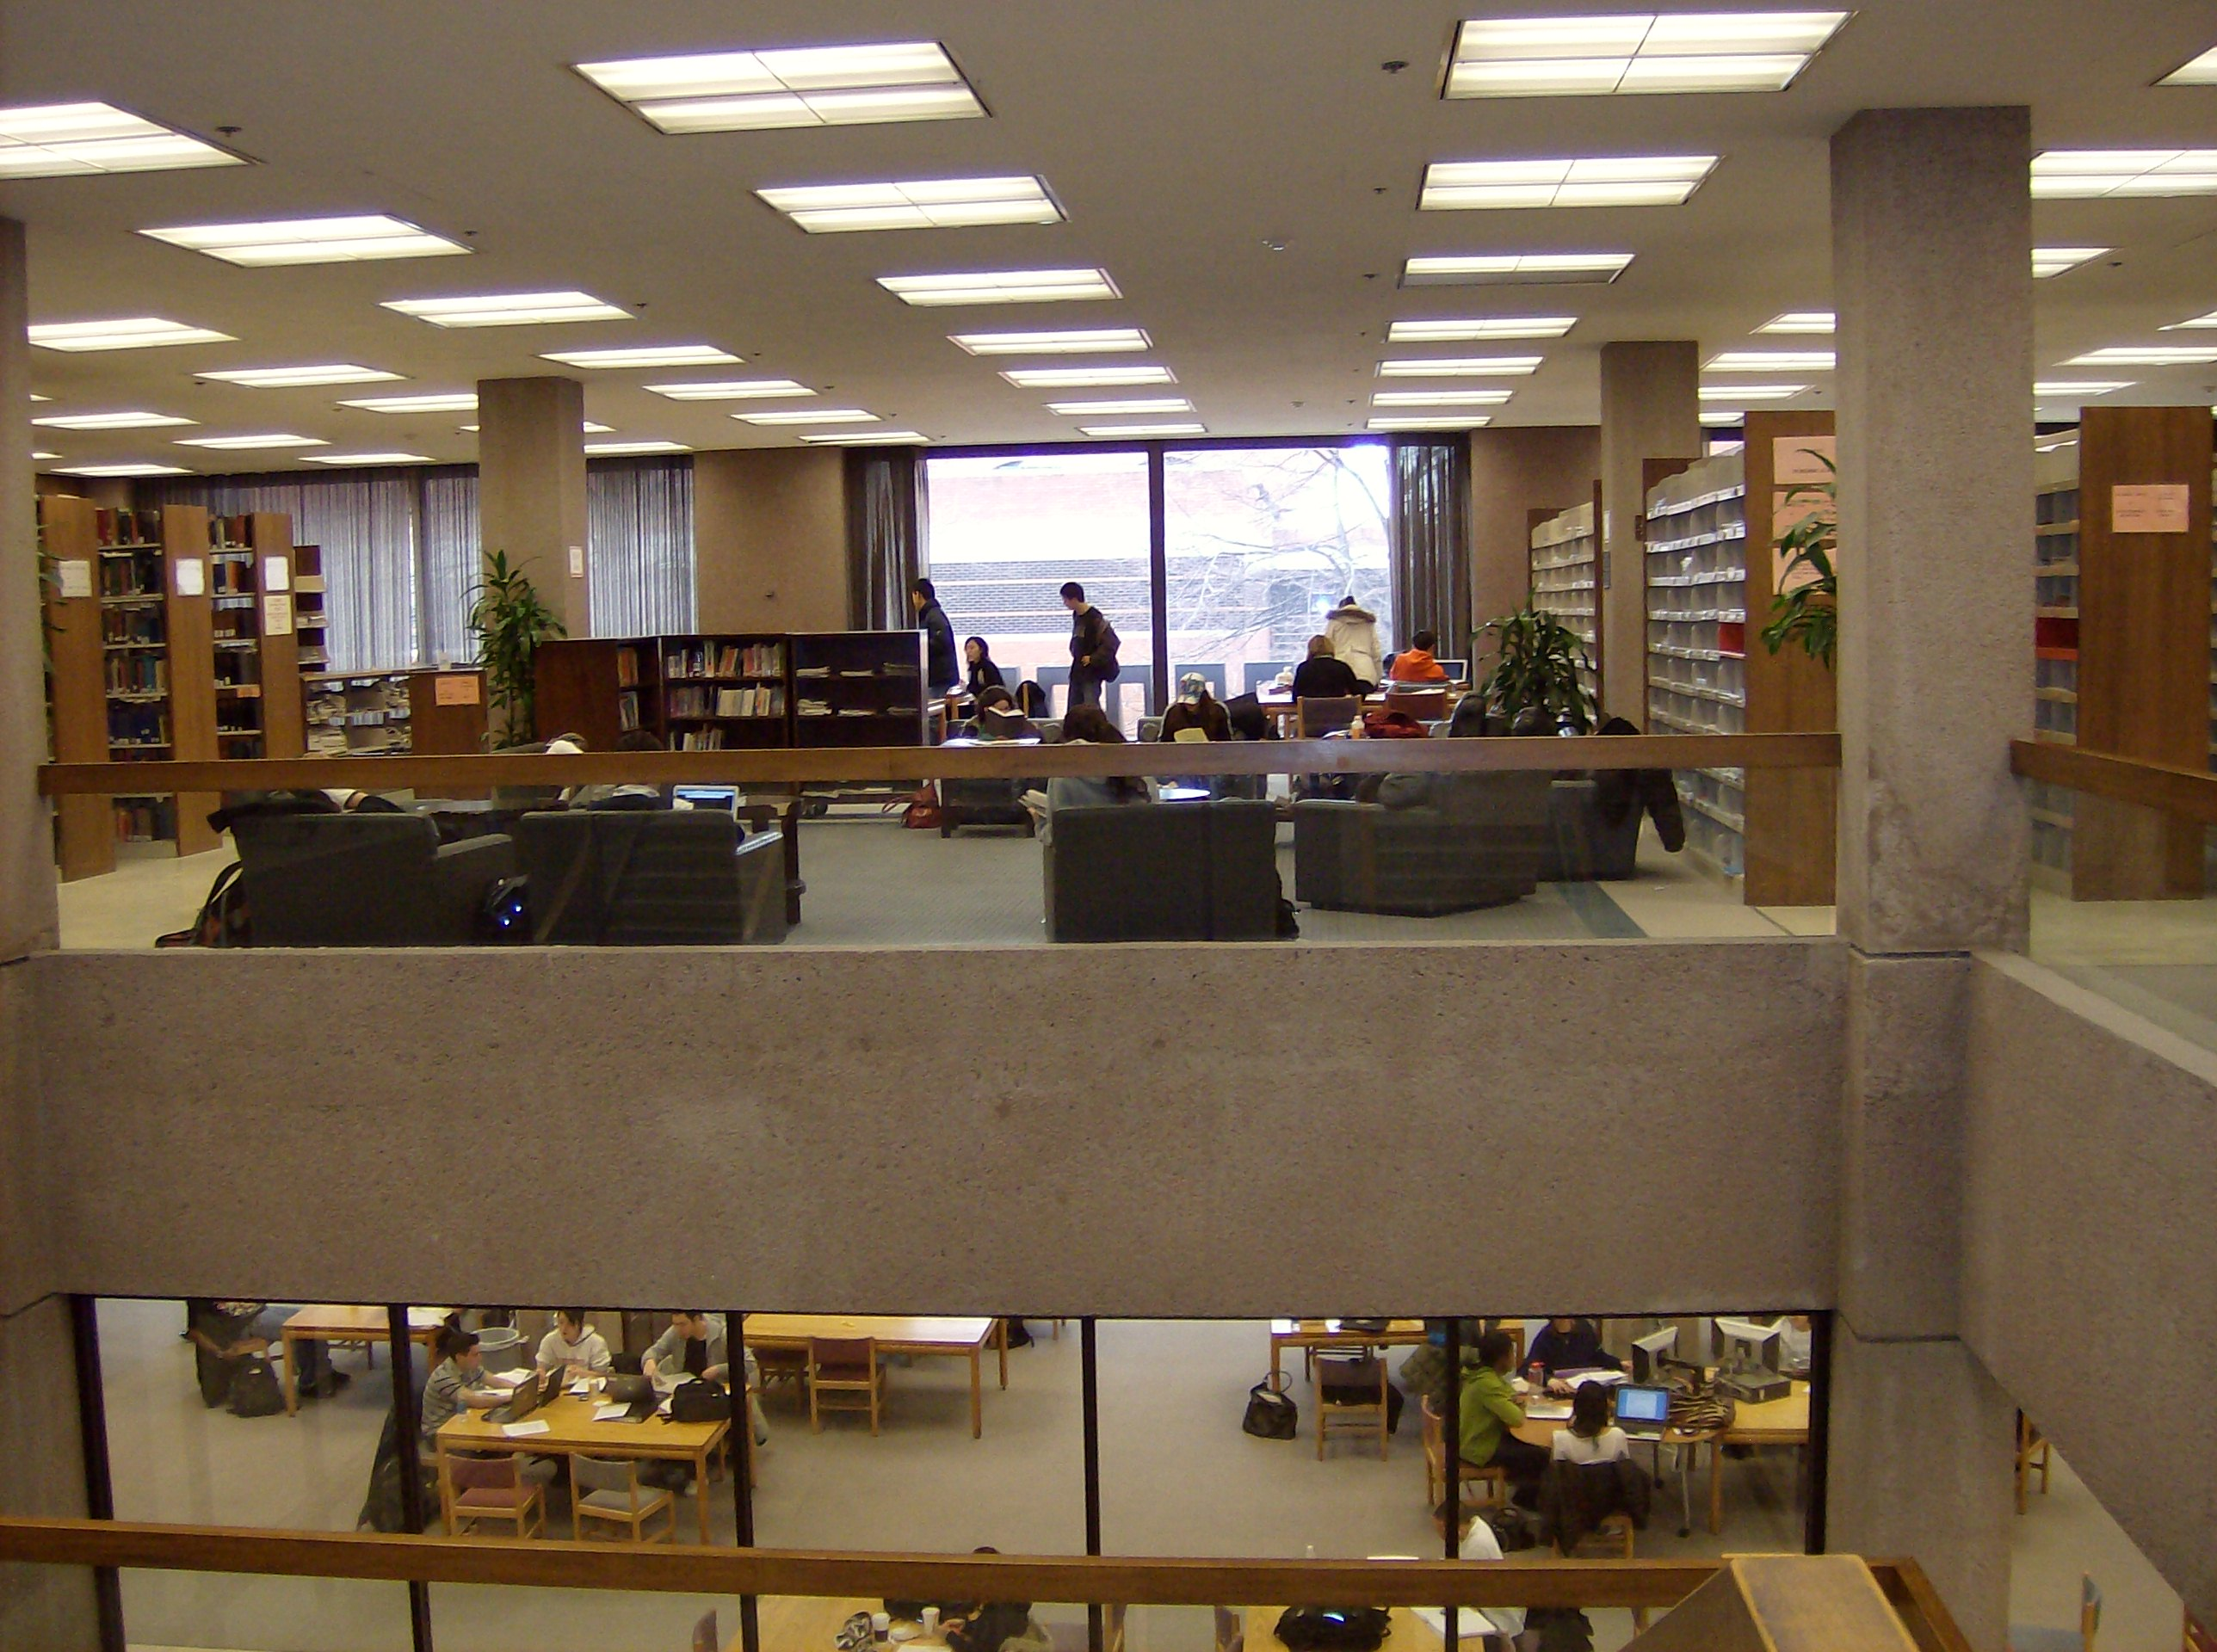 Image of interior of Bird Library